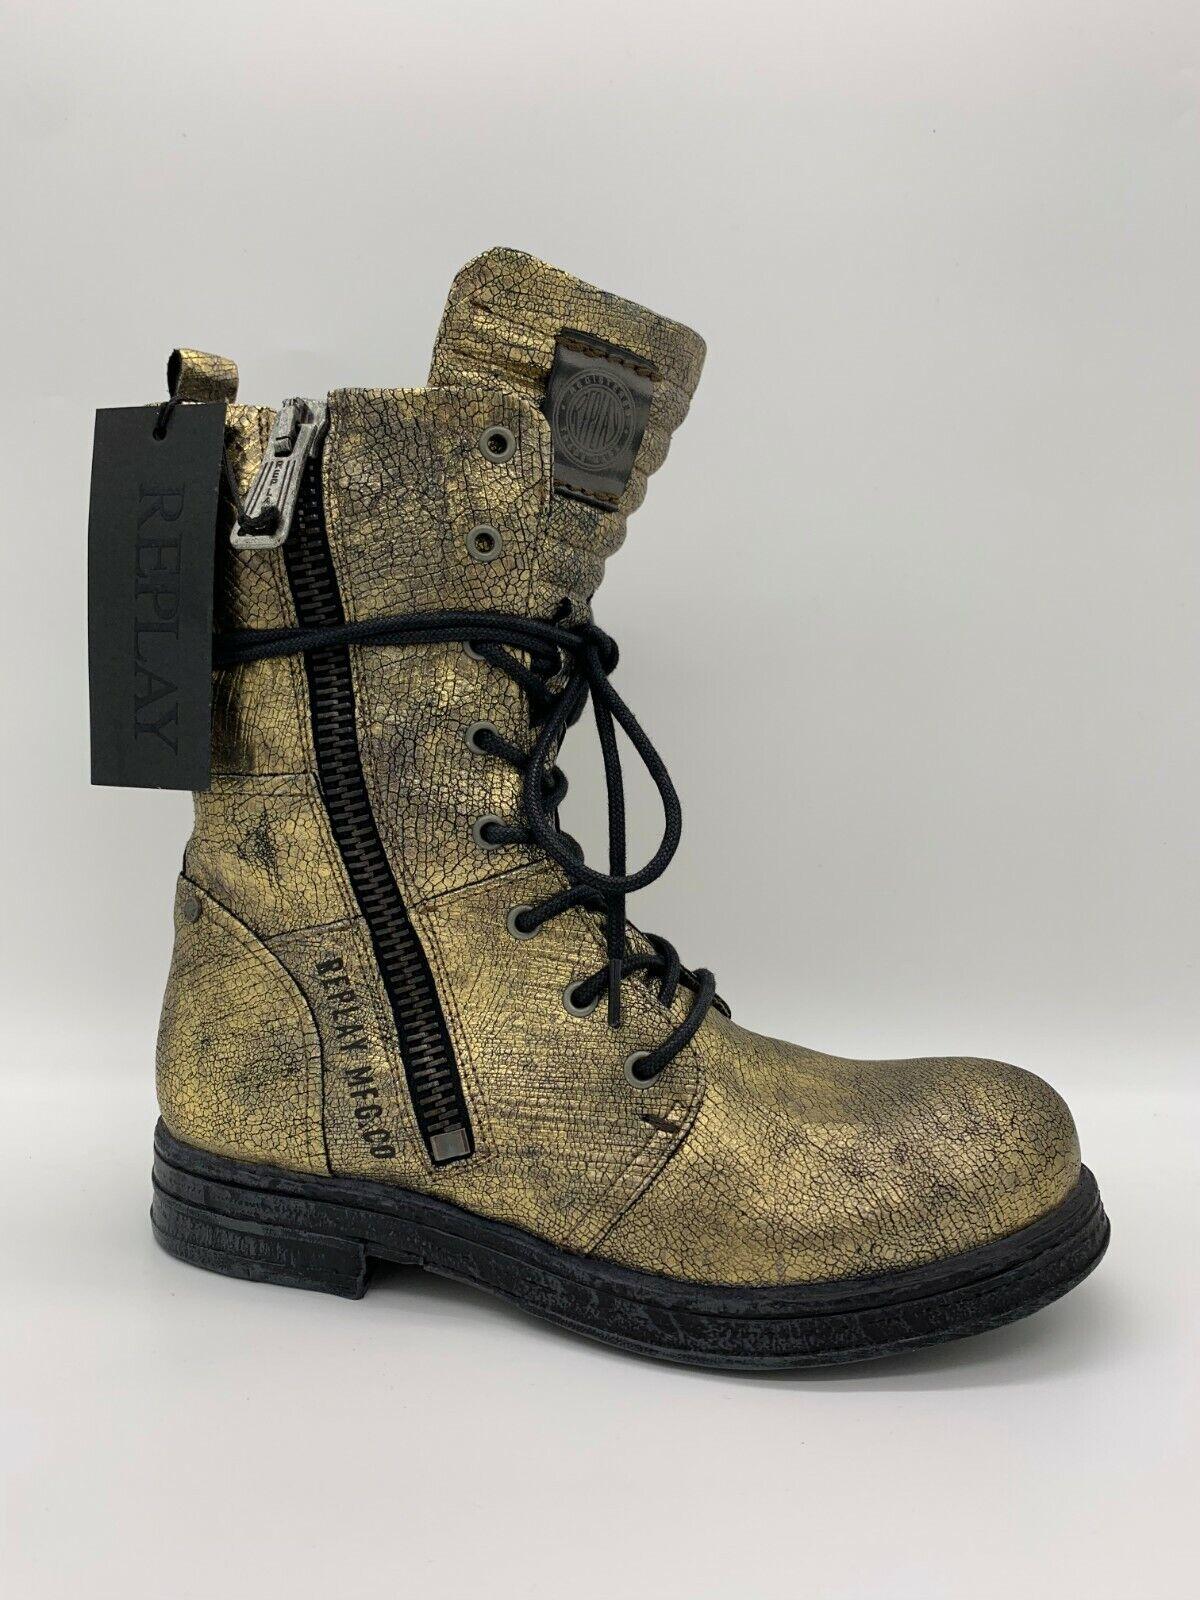 Replay Damenschuhe Schuhe Stiefel Stiefelette Stiefel Leder Evy Platin